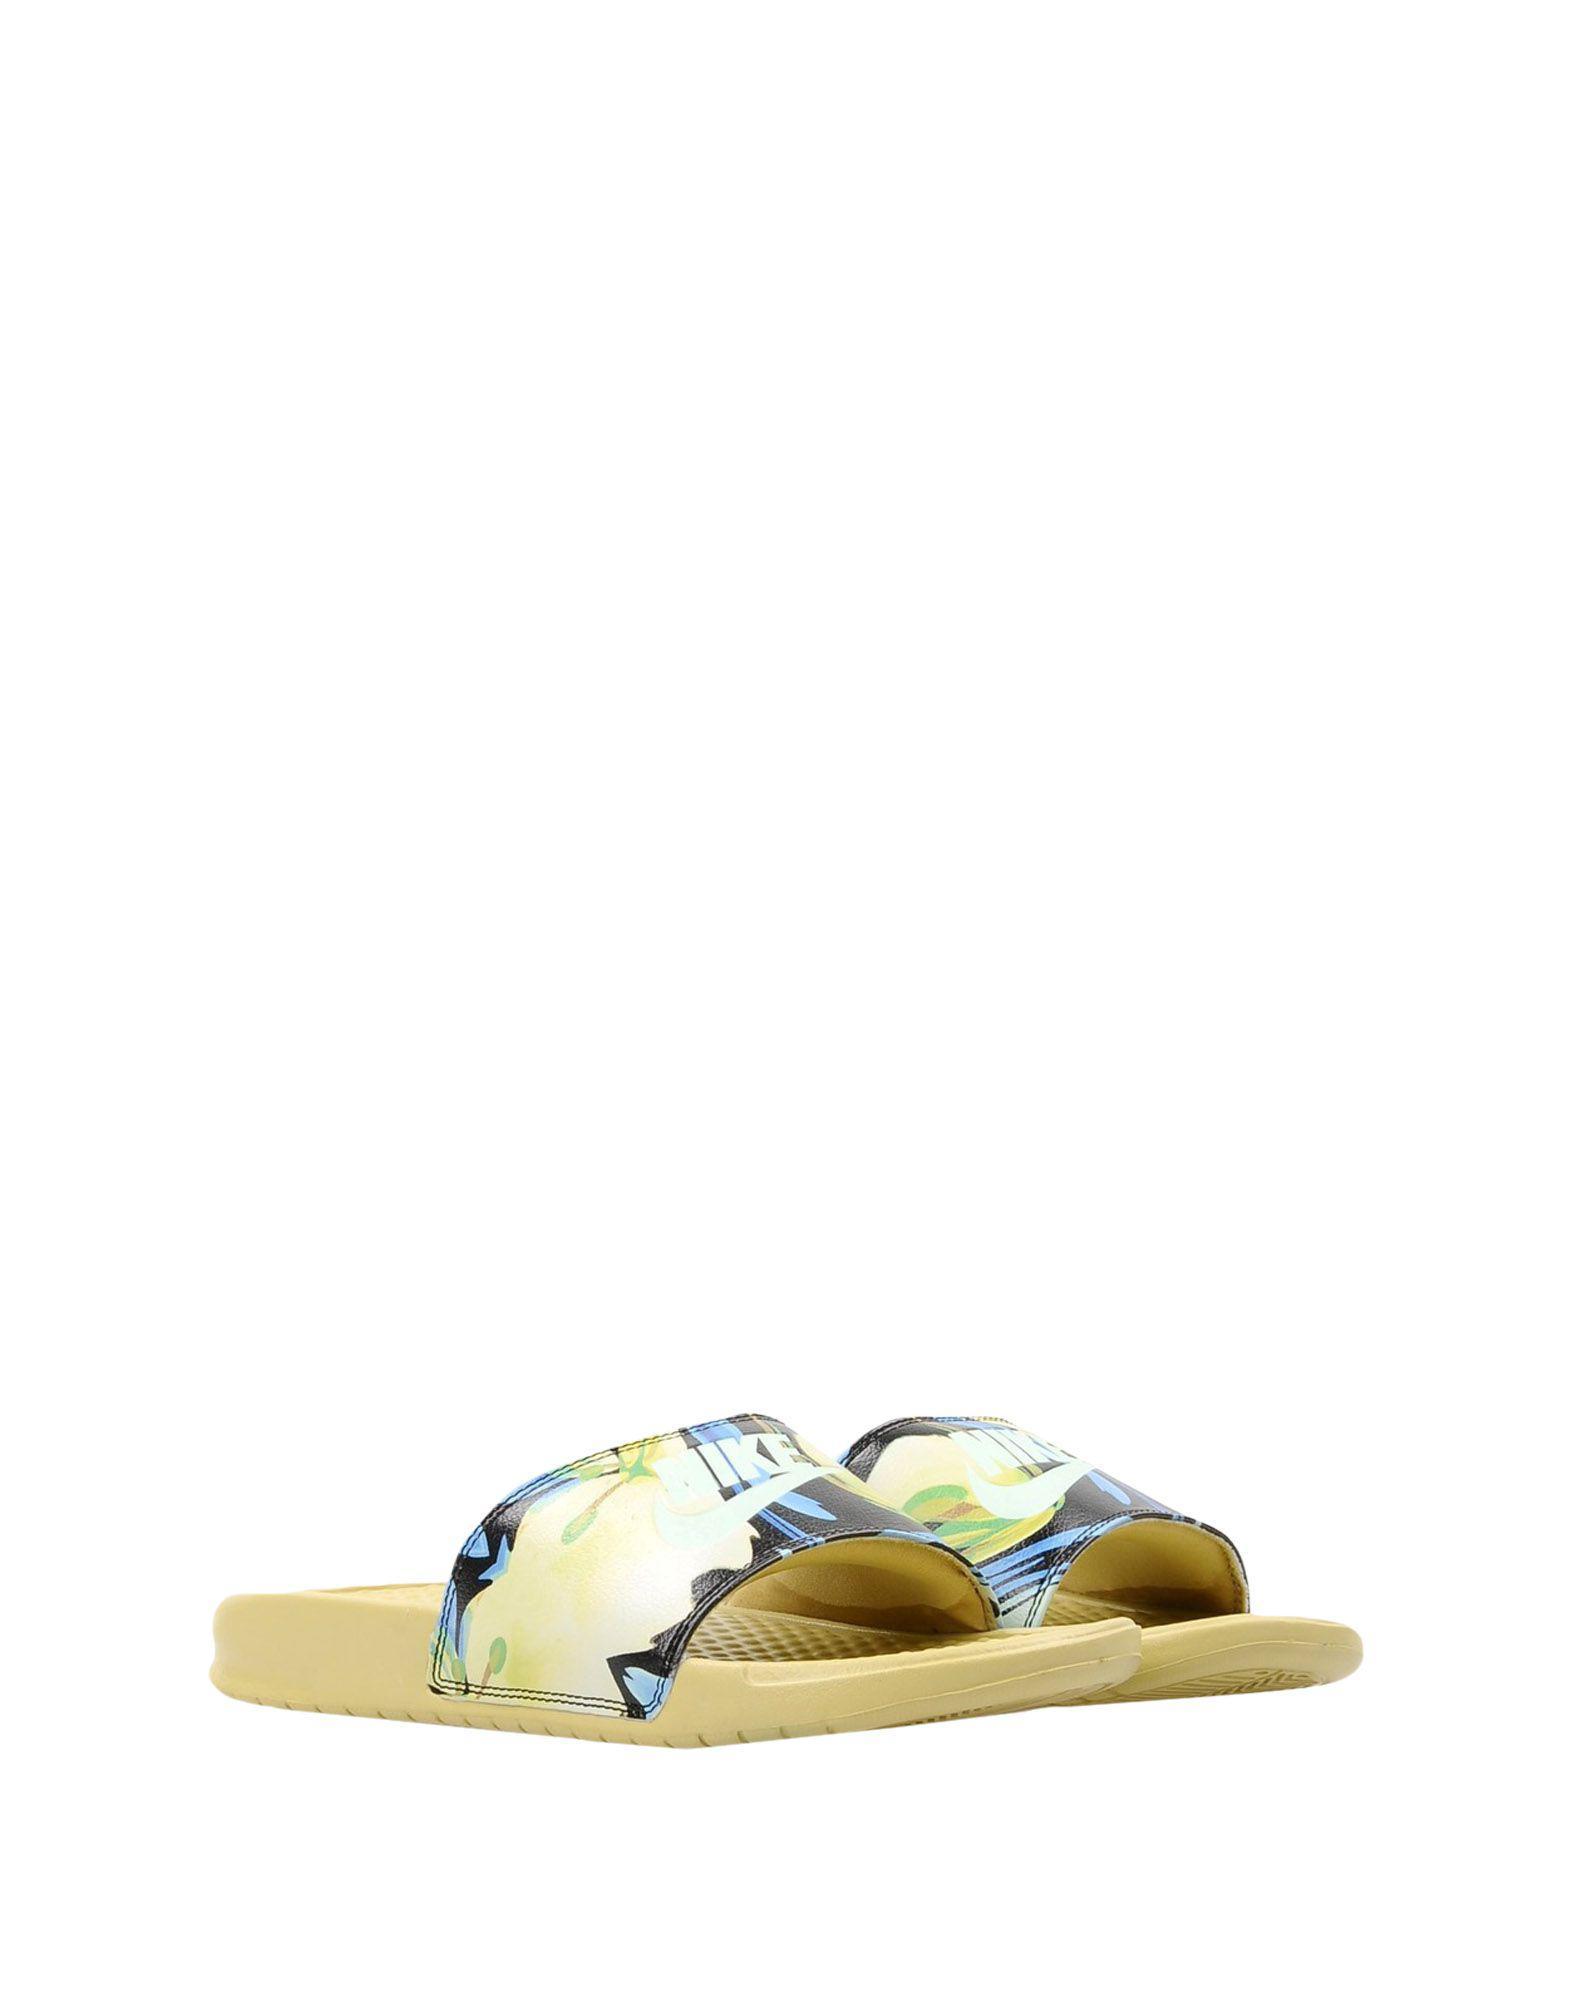 79ad2e2dd685 Nike Sandals in Green - Lyst